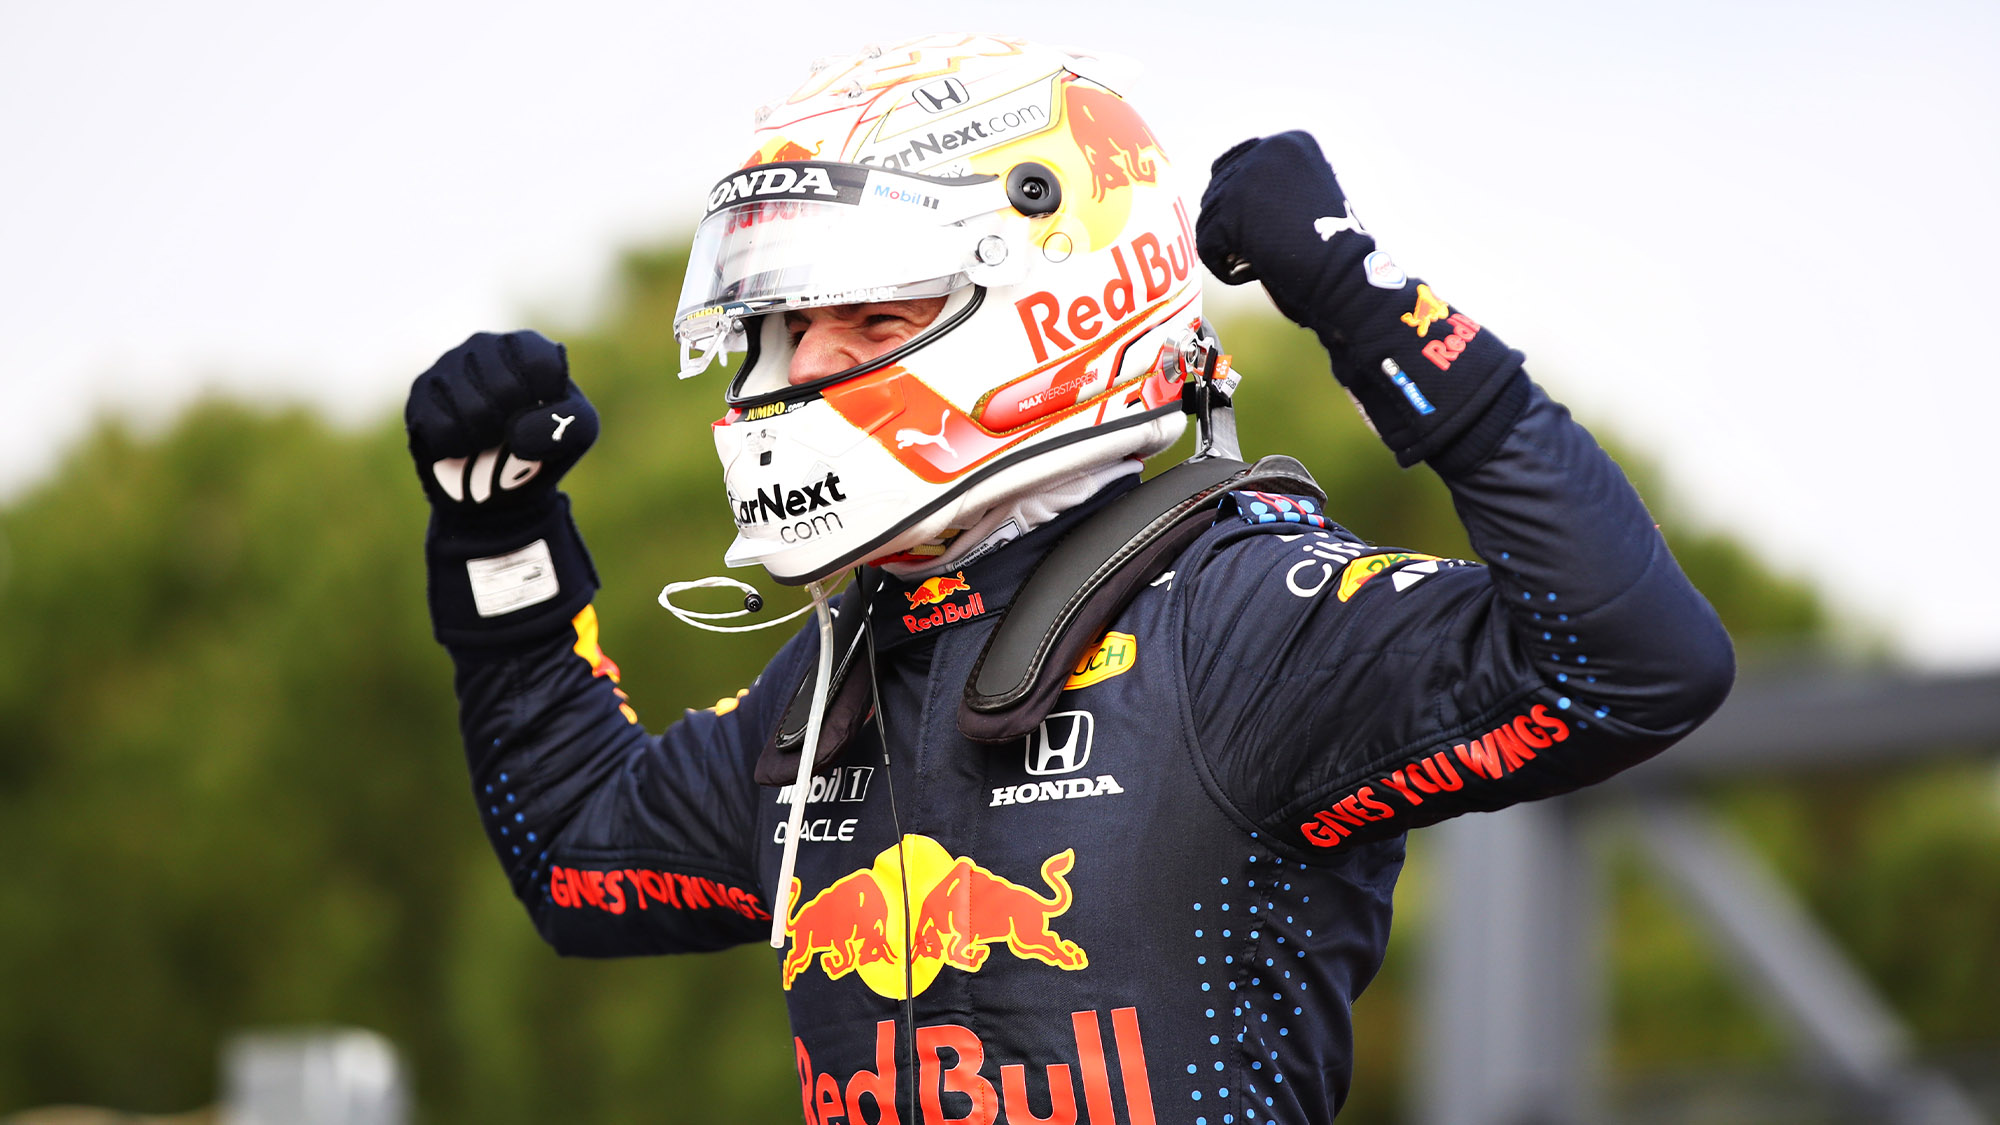 Max Verstappen celebrates winning the 2021 Emilia Romagna Grand Prix